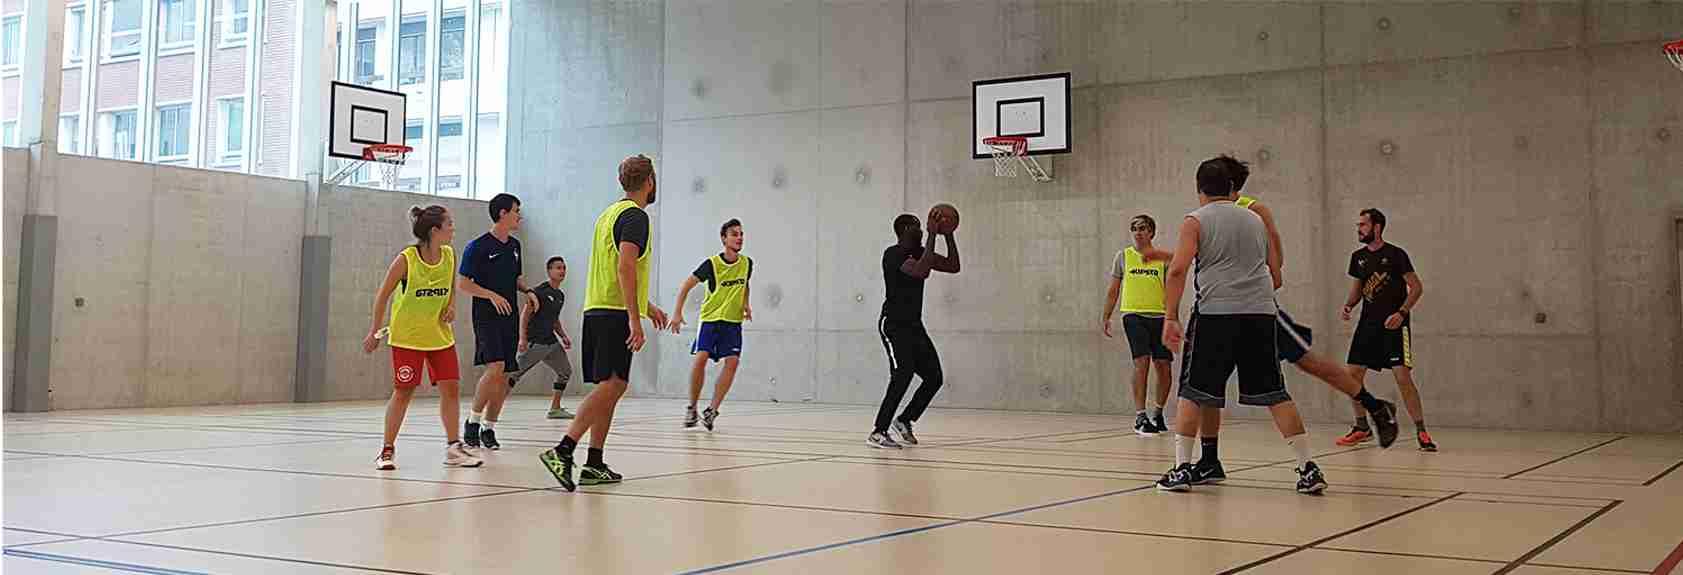 Image de Basketball